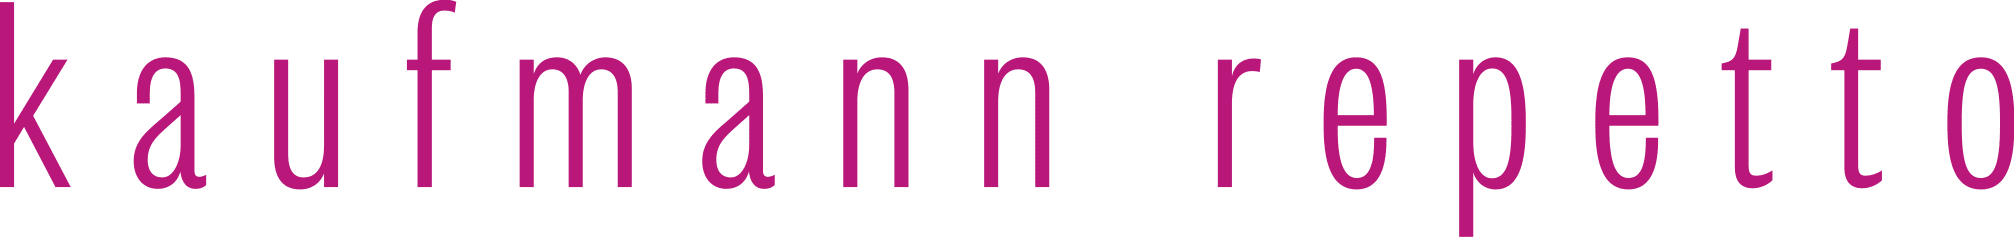 Kaufmann Repetto company logo